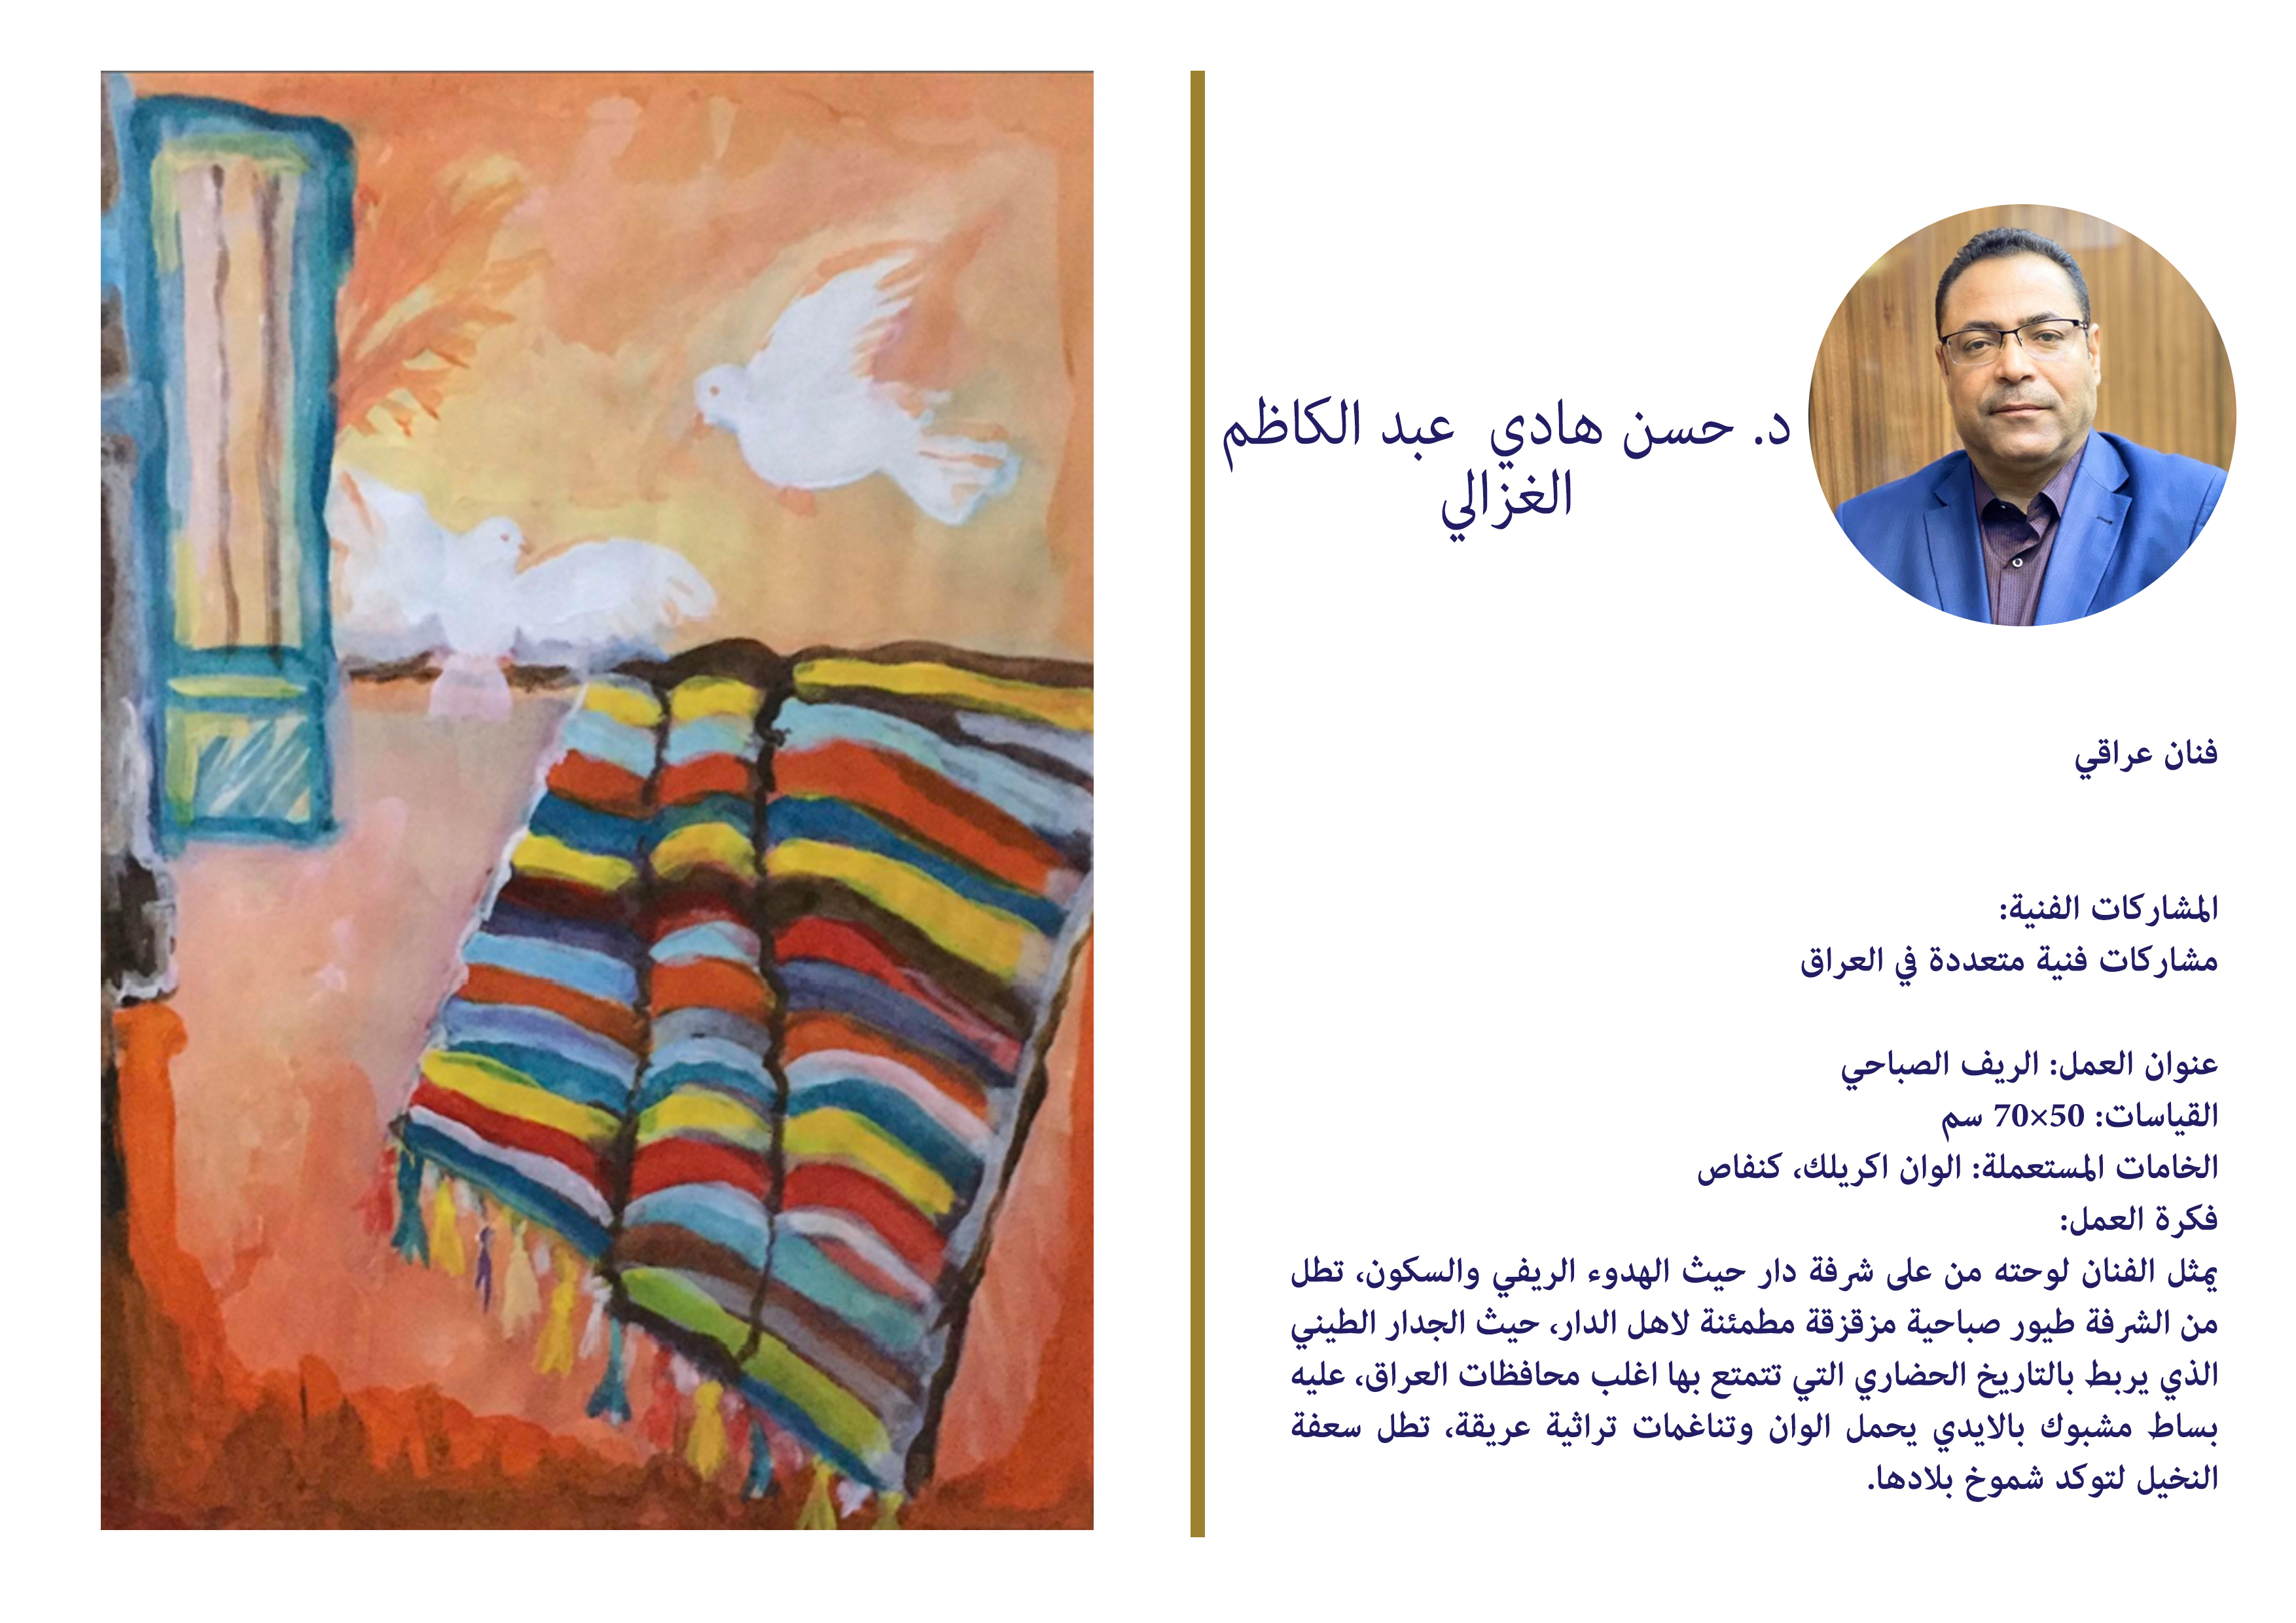 د. حسن هادي الغزالي